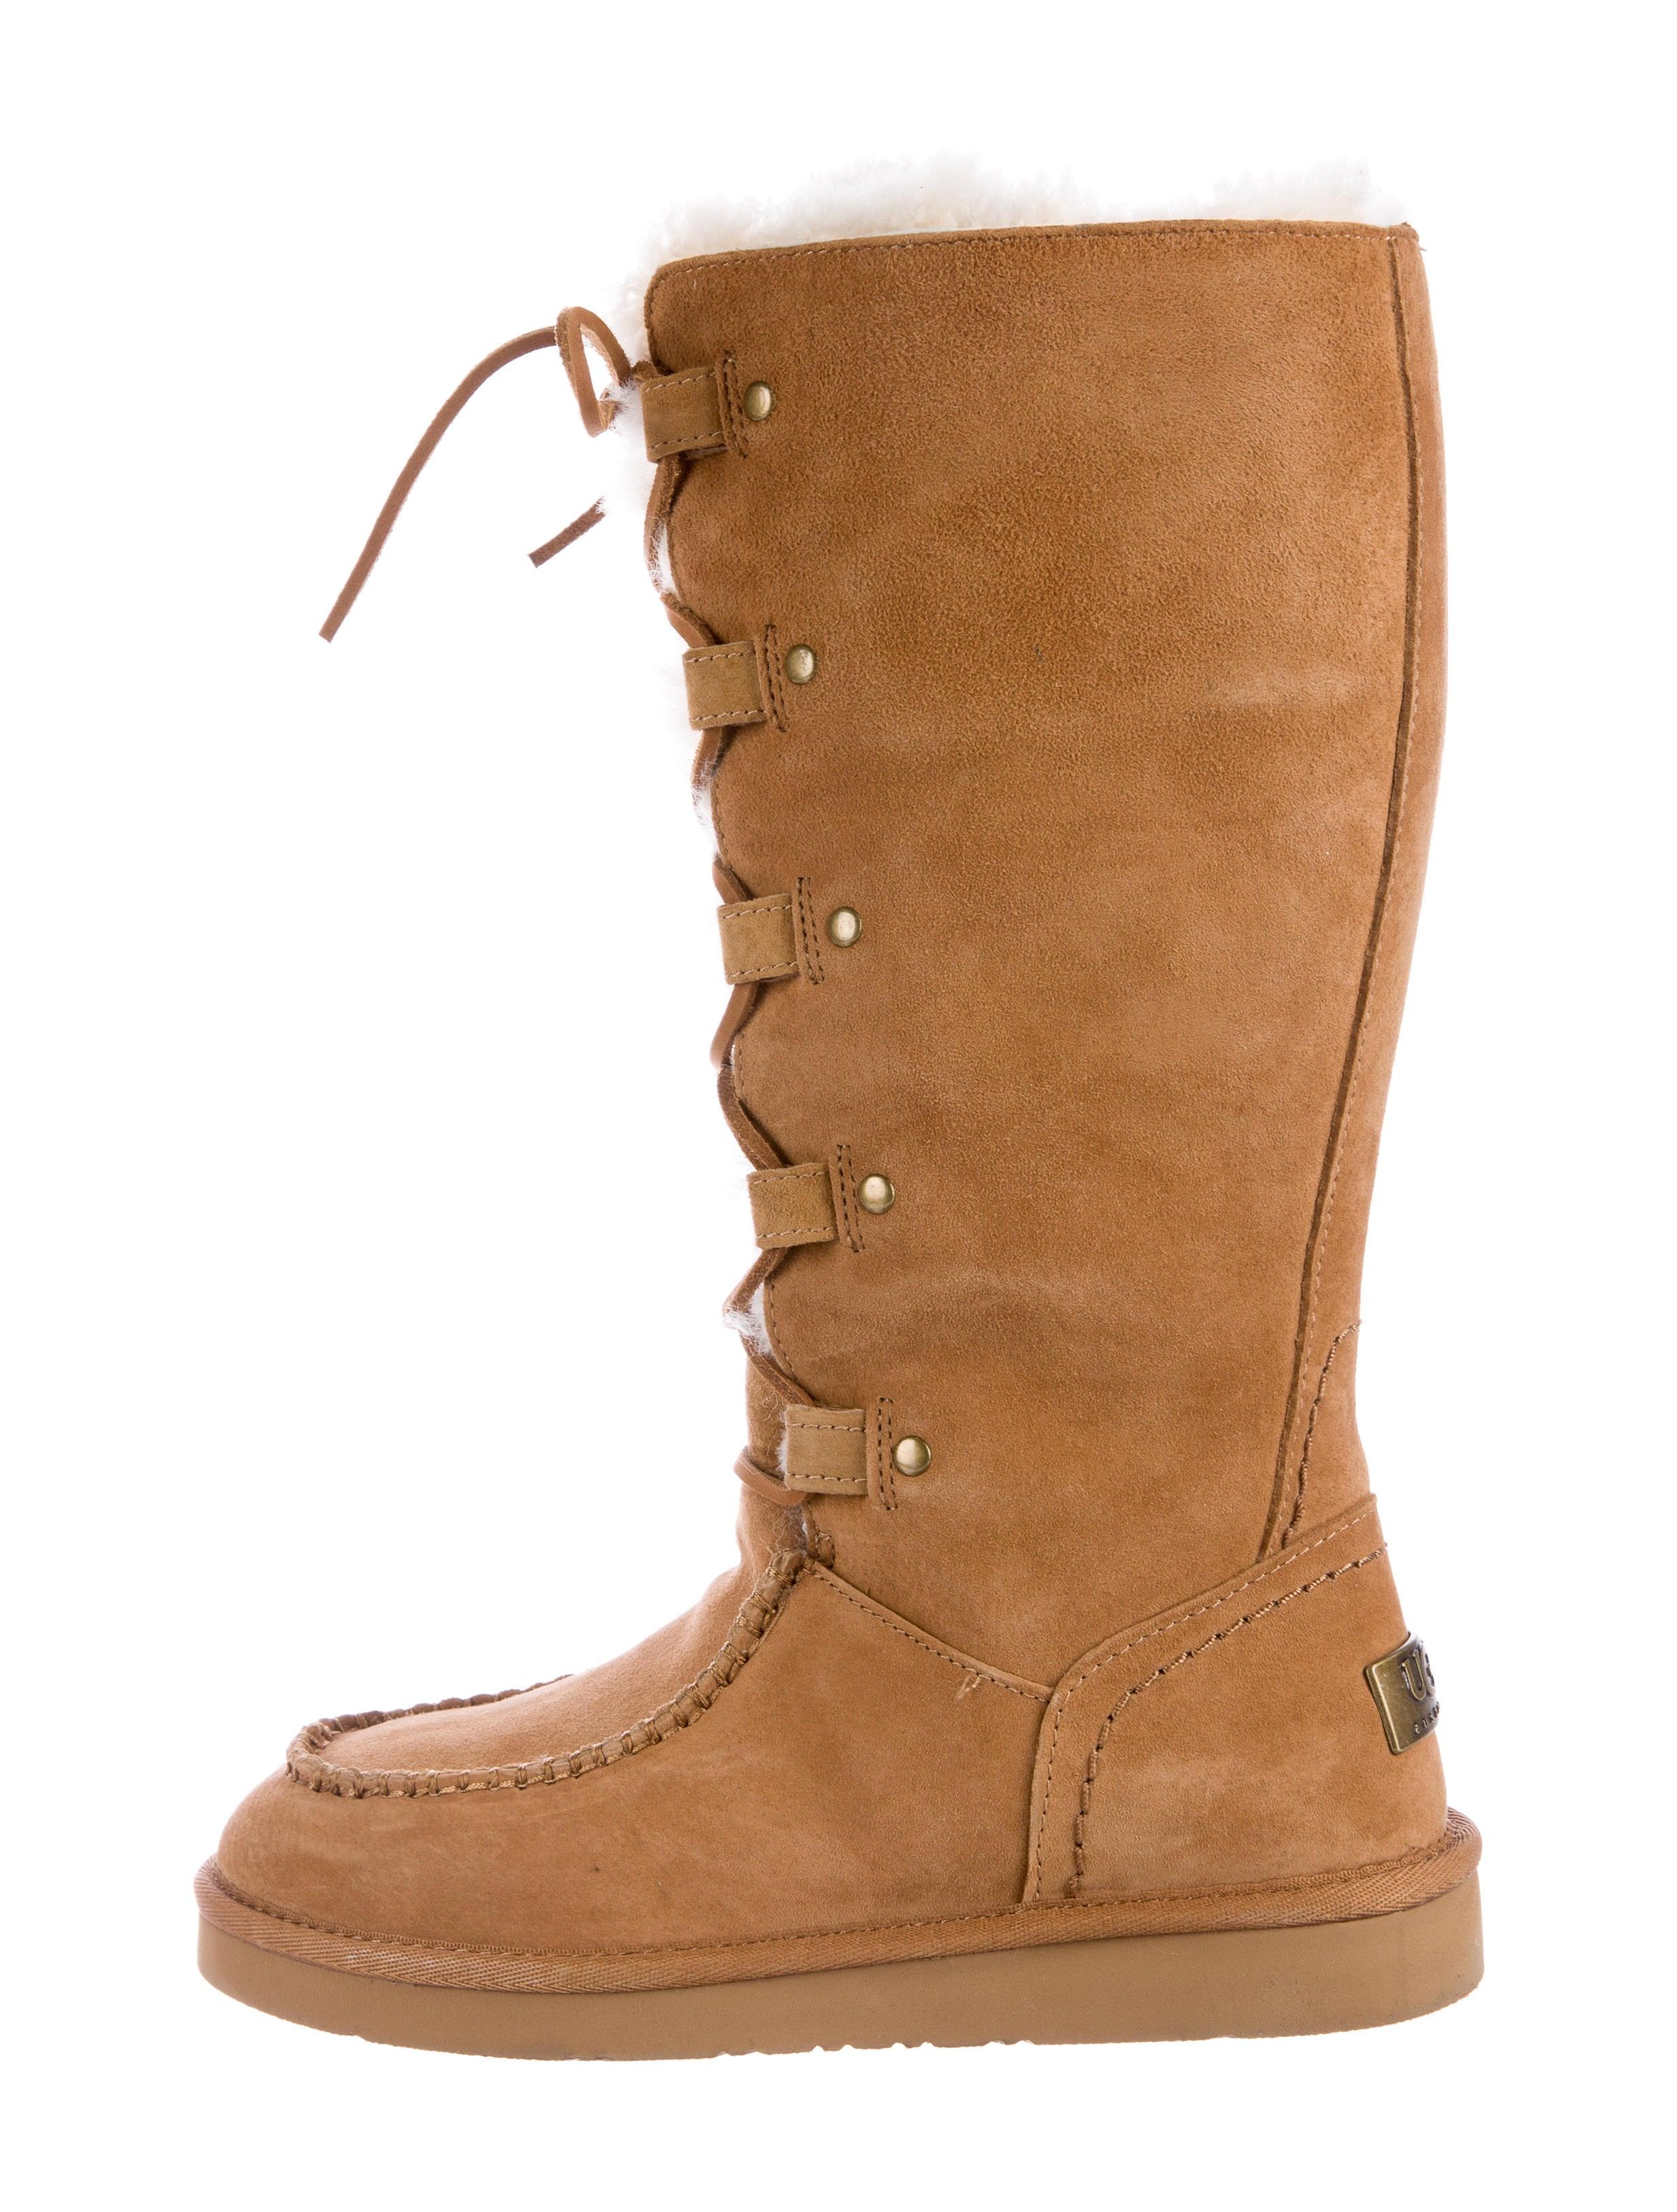 Ugg Australia Appalachian Lace Up Boots Shoes Wuugg20309 The